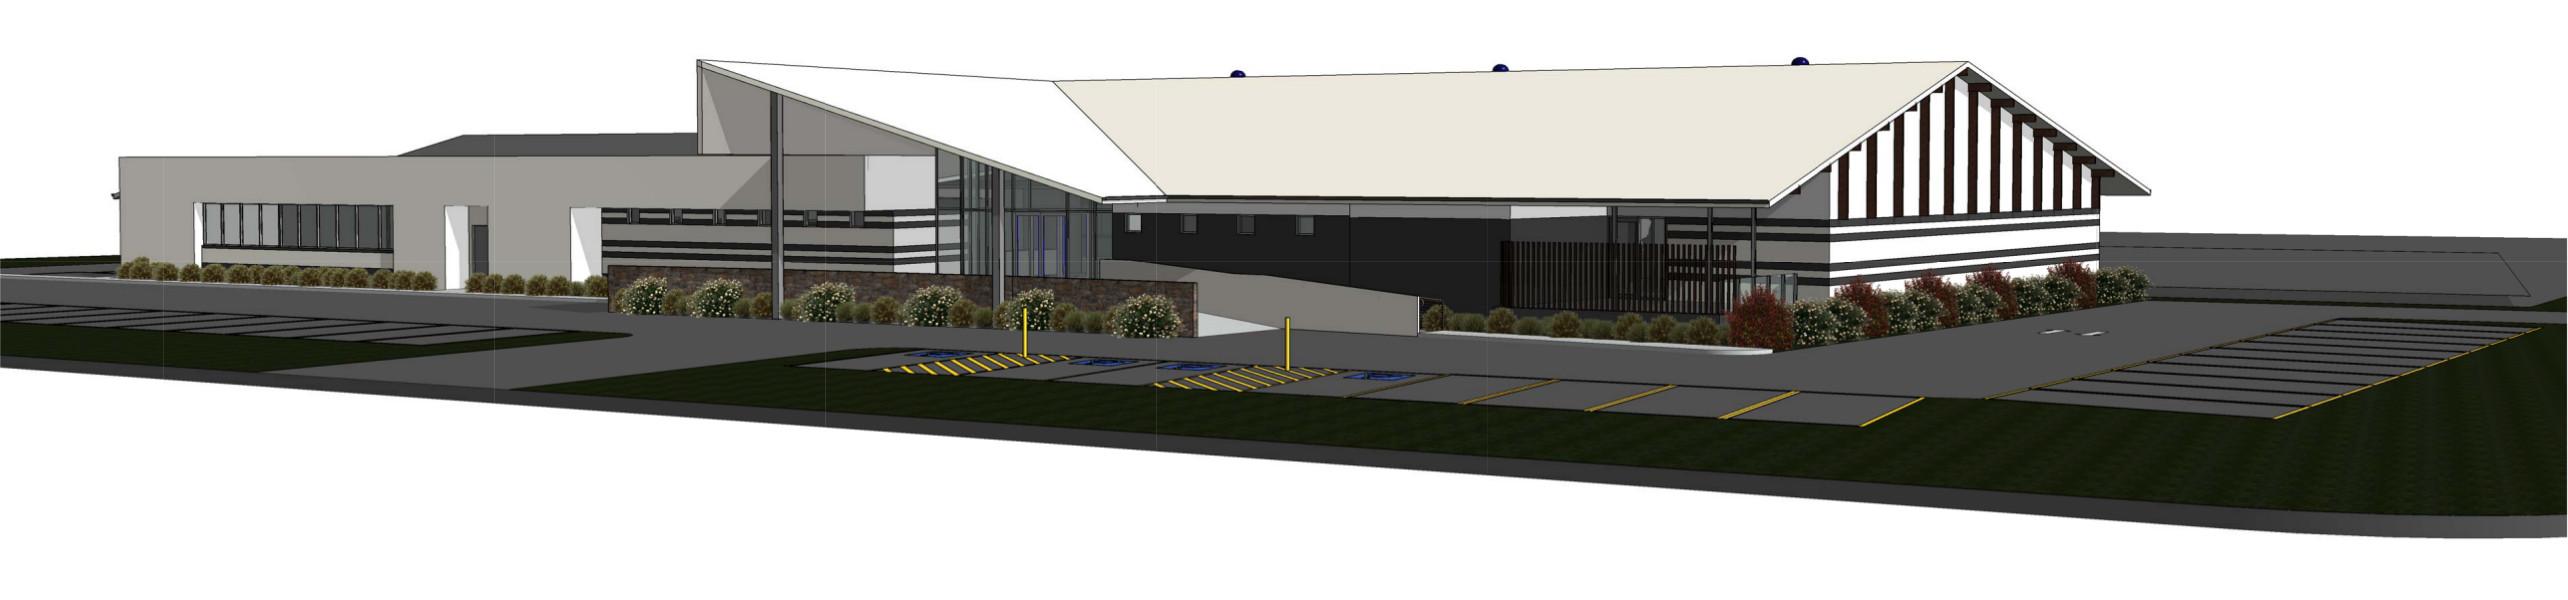 Sandhills Sports Club Concept